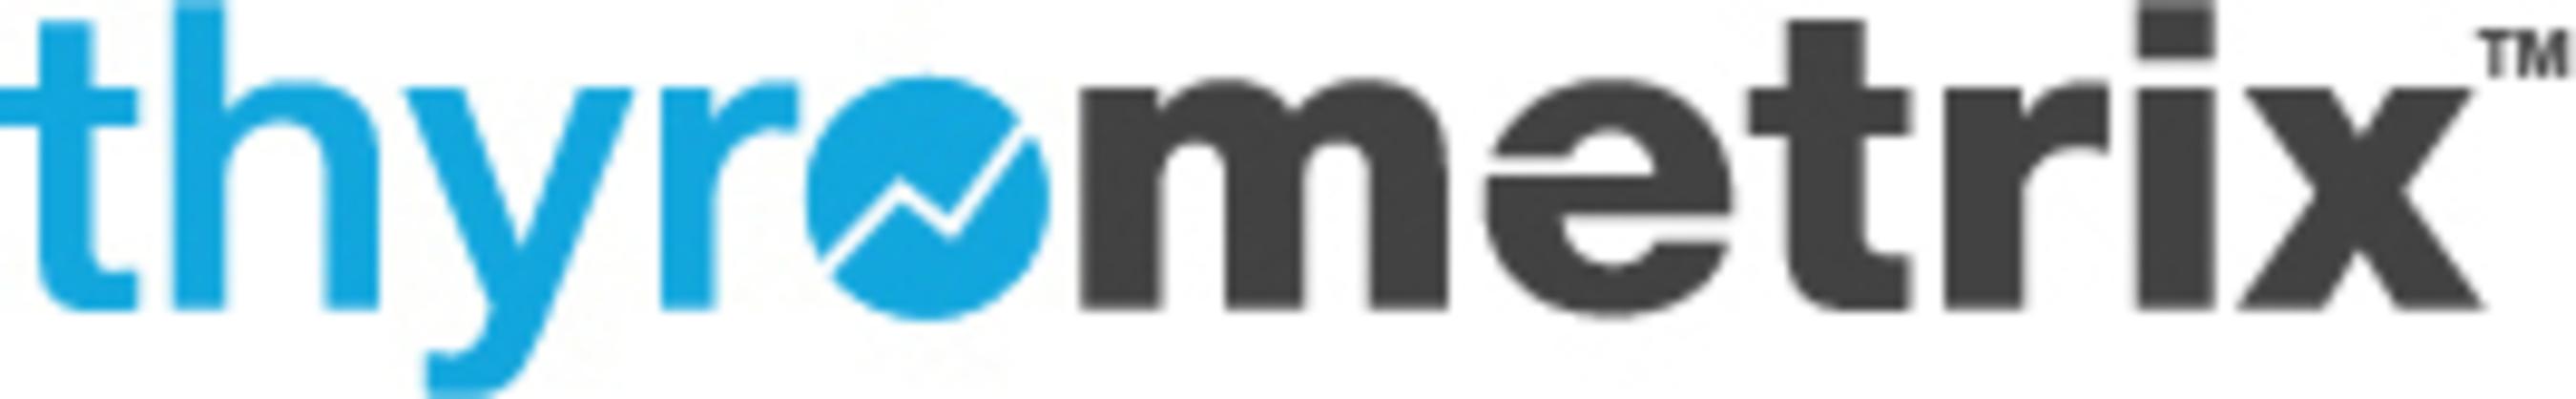 ThyroMetrix USA, Inc. (PRNewsFoto/ThyroMetrix, Inc.) (PRNewsFoto/THYROMETRIX, INC.)